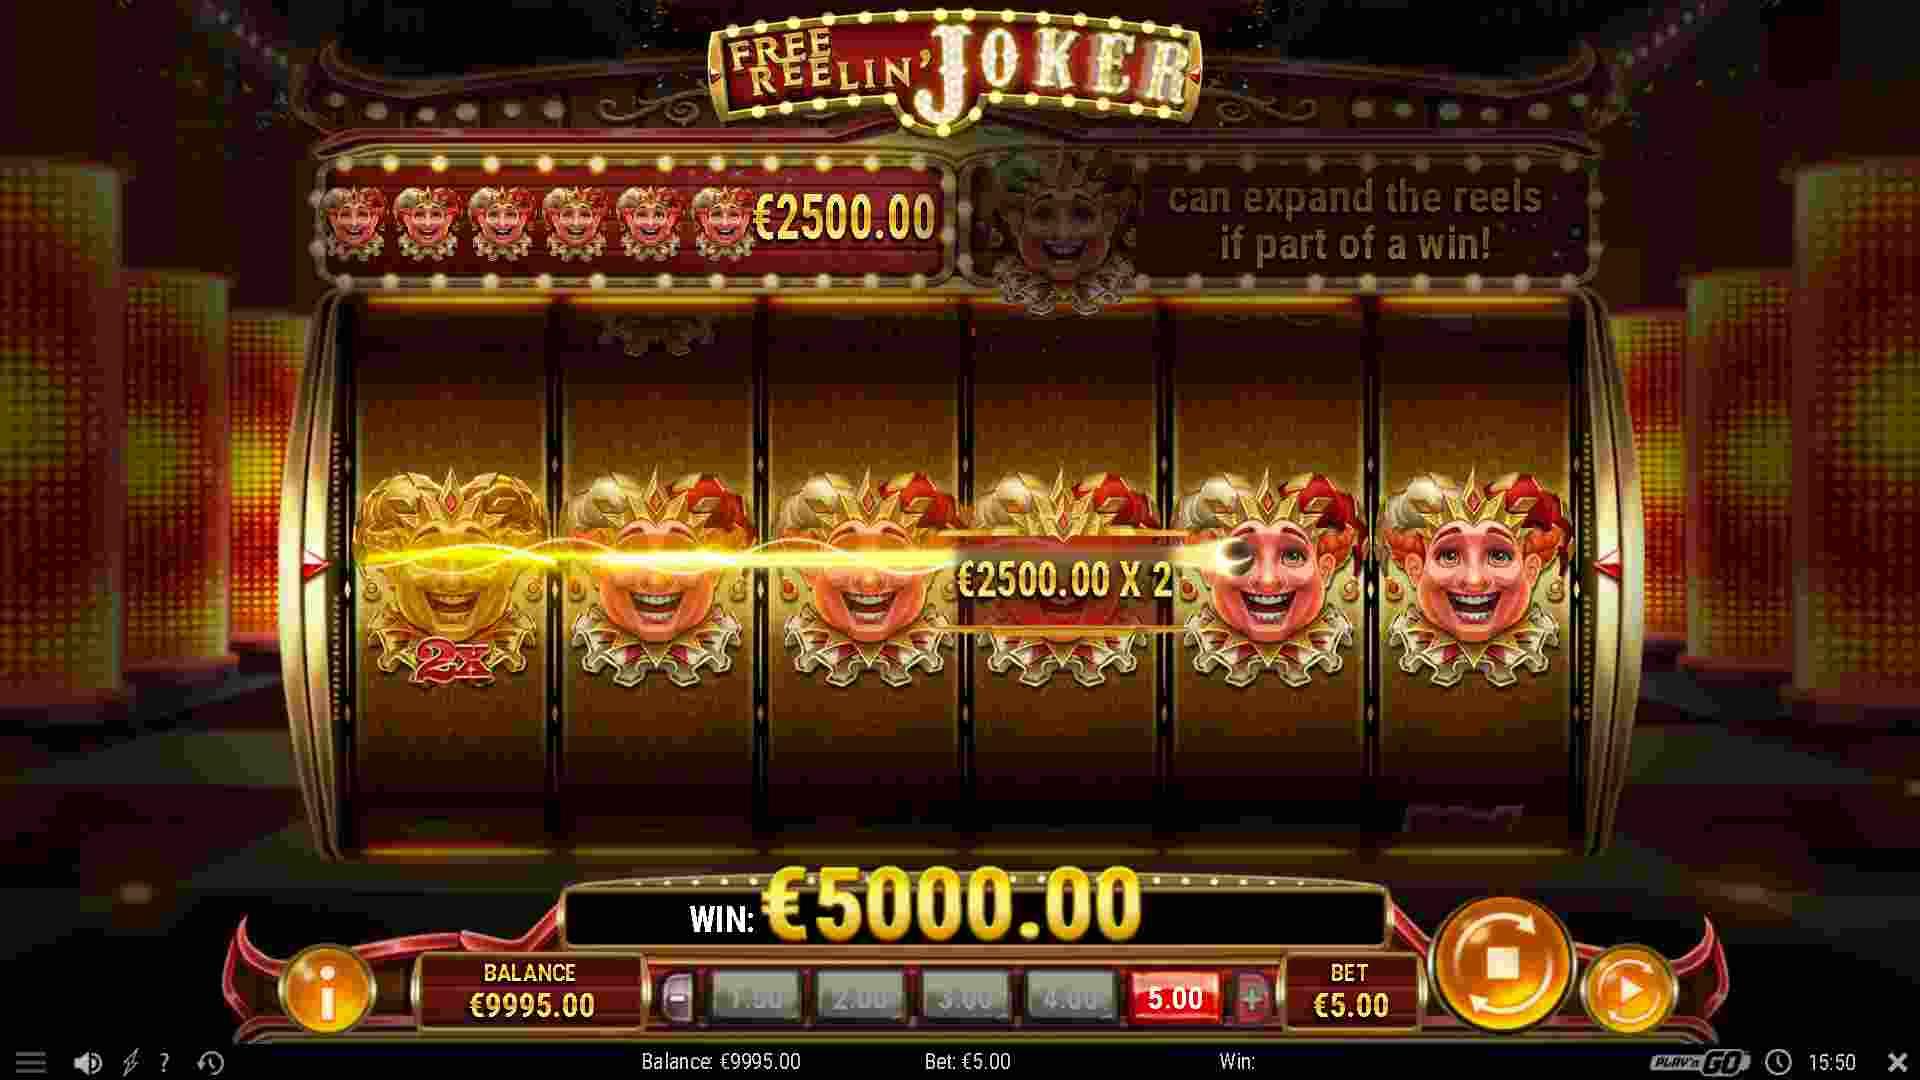 Free Reelin' Joker Gameplay 2